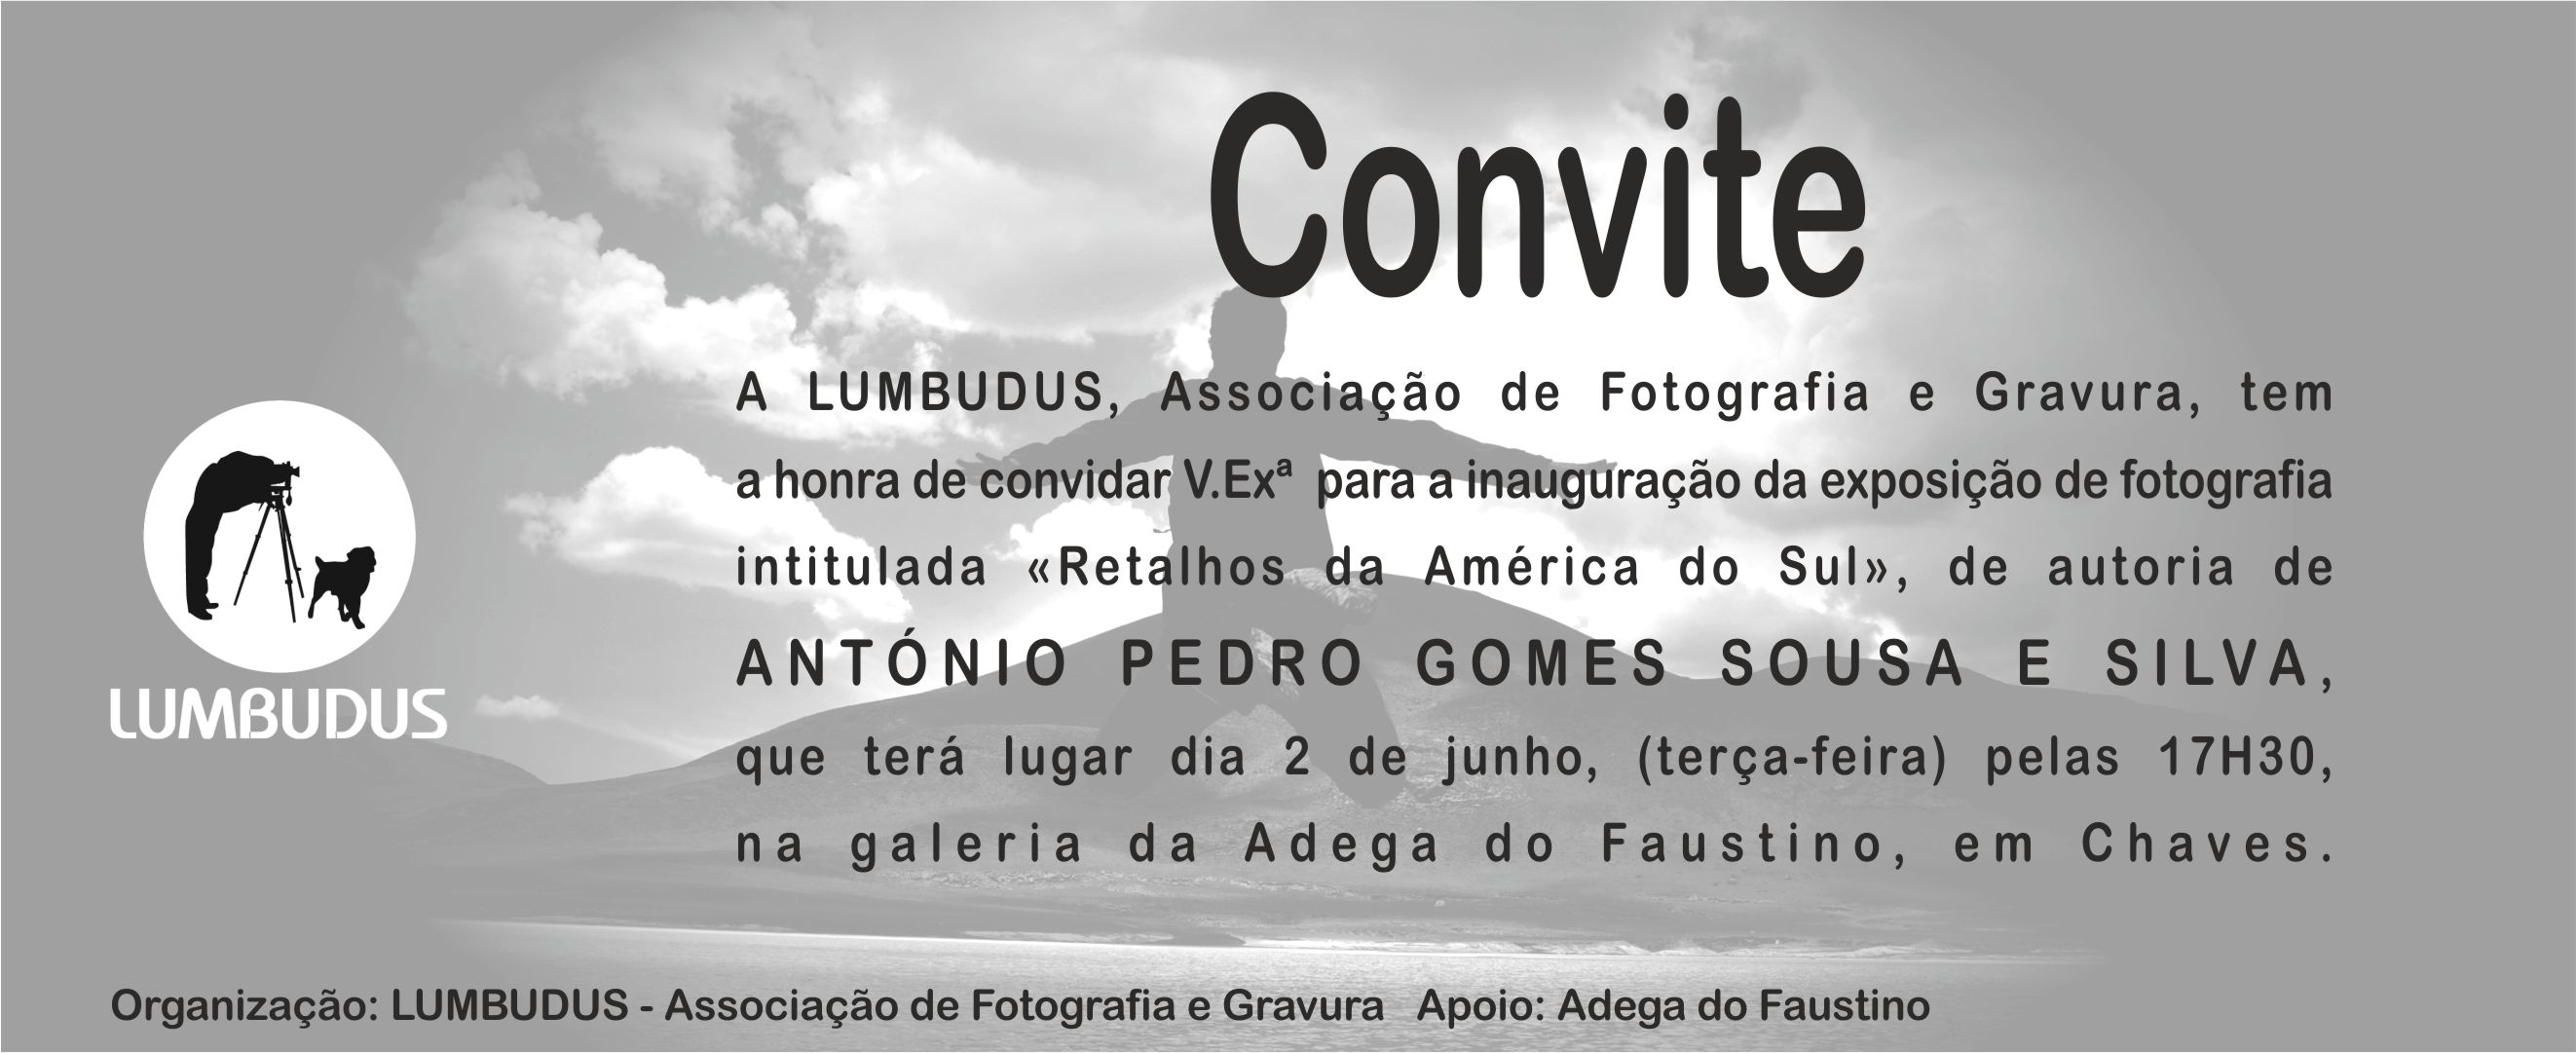 convite-web.jpg